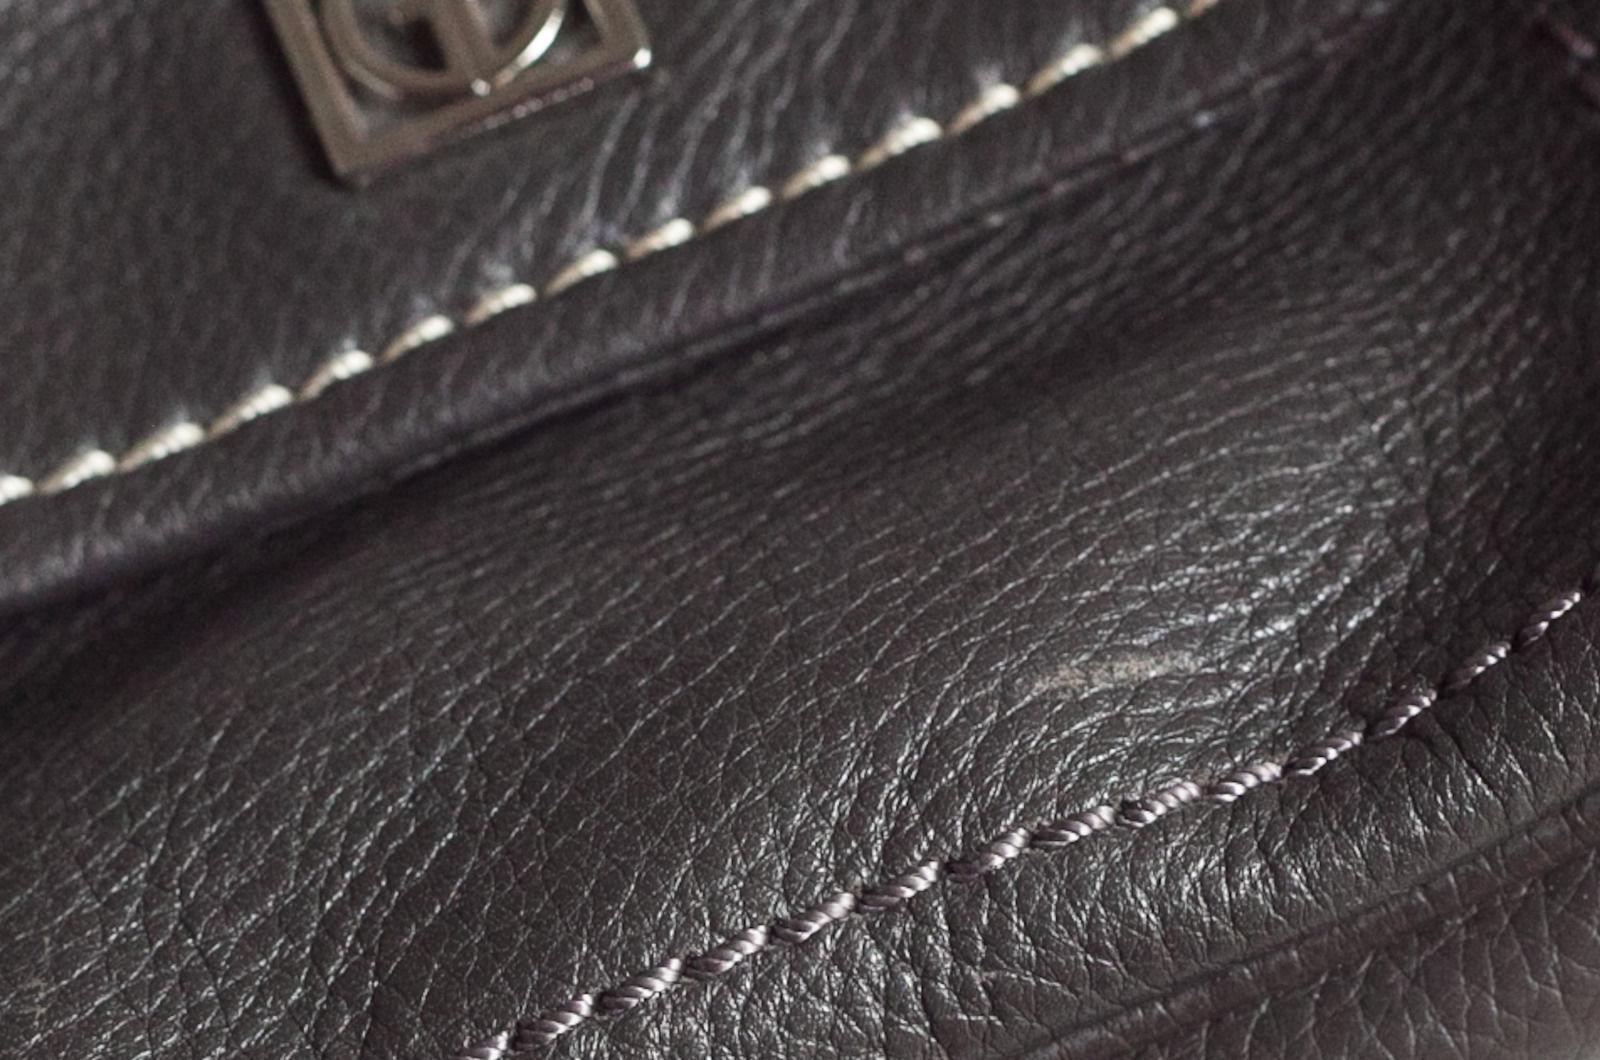 Giani Bernini Womens Small Soft Grey Leather Purse Shoulder Strap